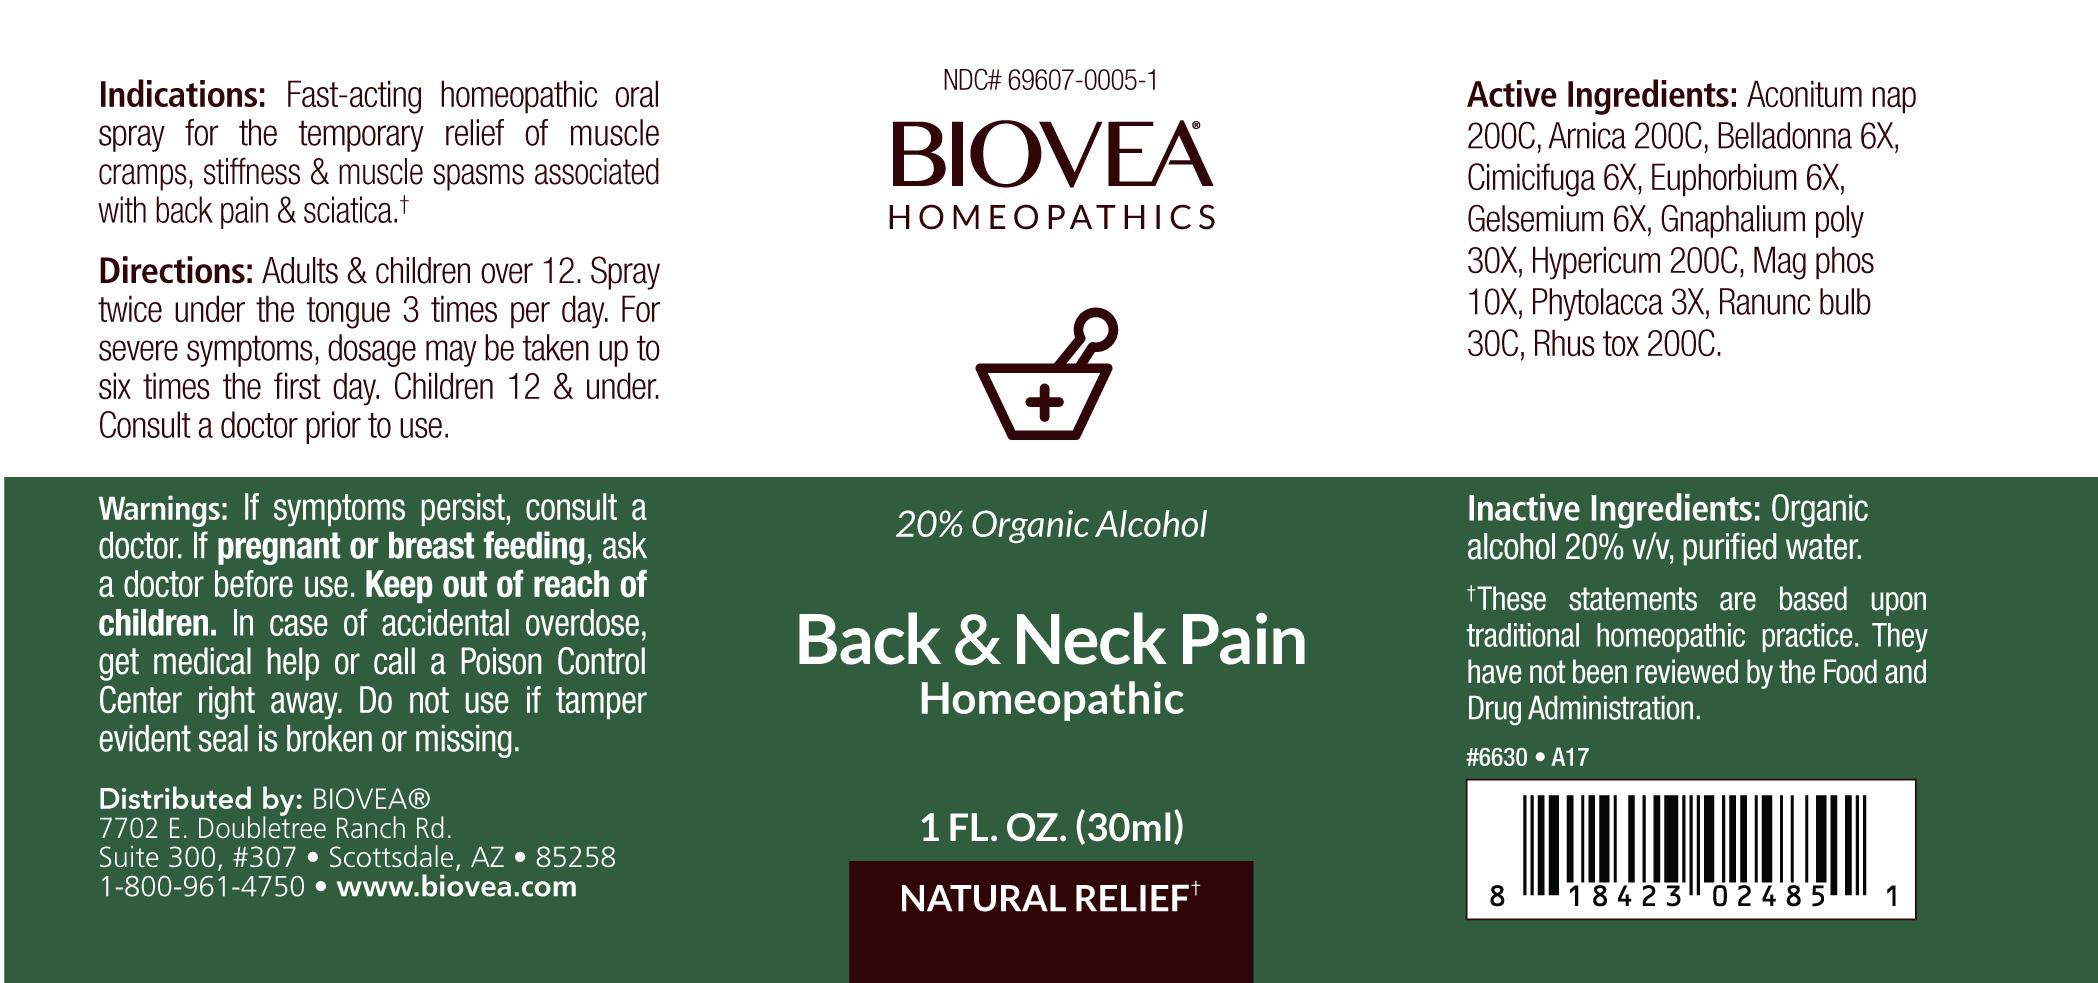 Q A: Alternative Remedies recommend